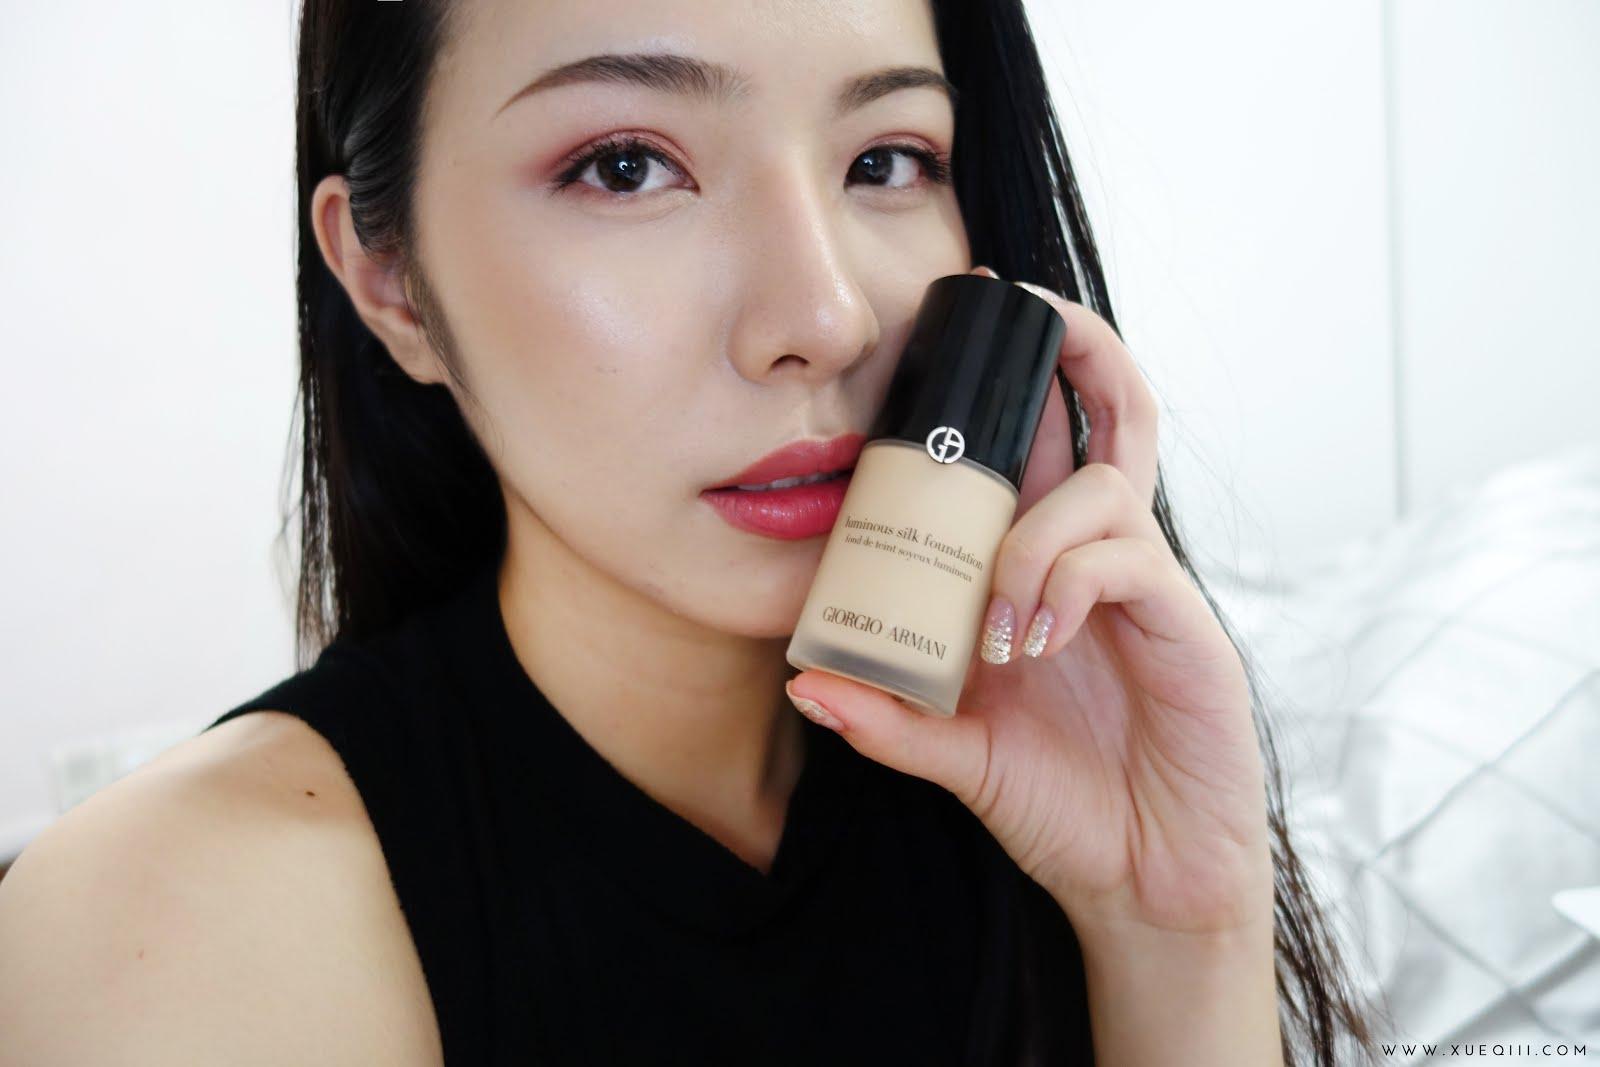 093409122bb7 You. You. Giorgio Armani Luminous Silk Foundation Review Xueqi S Beauty ...